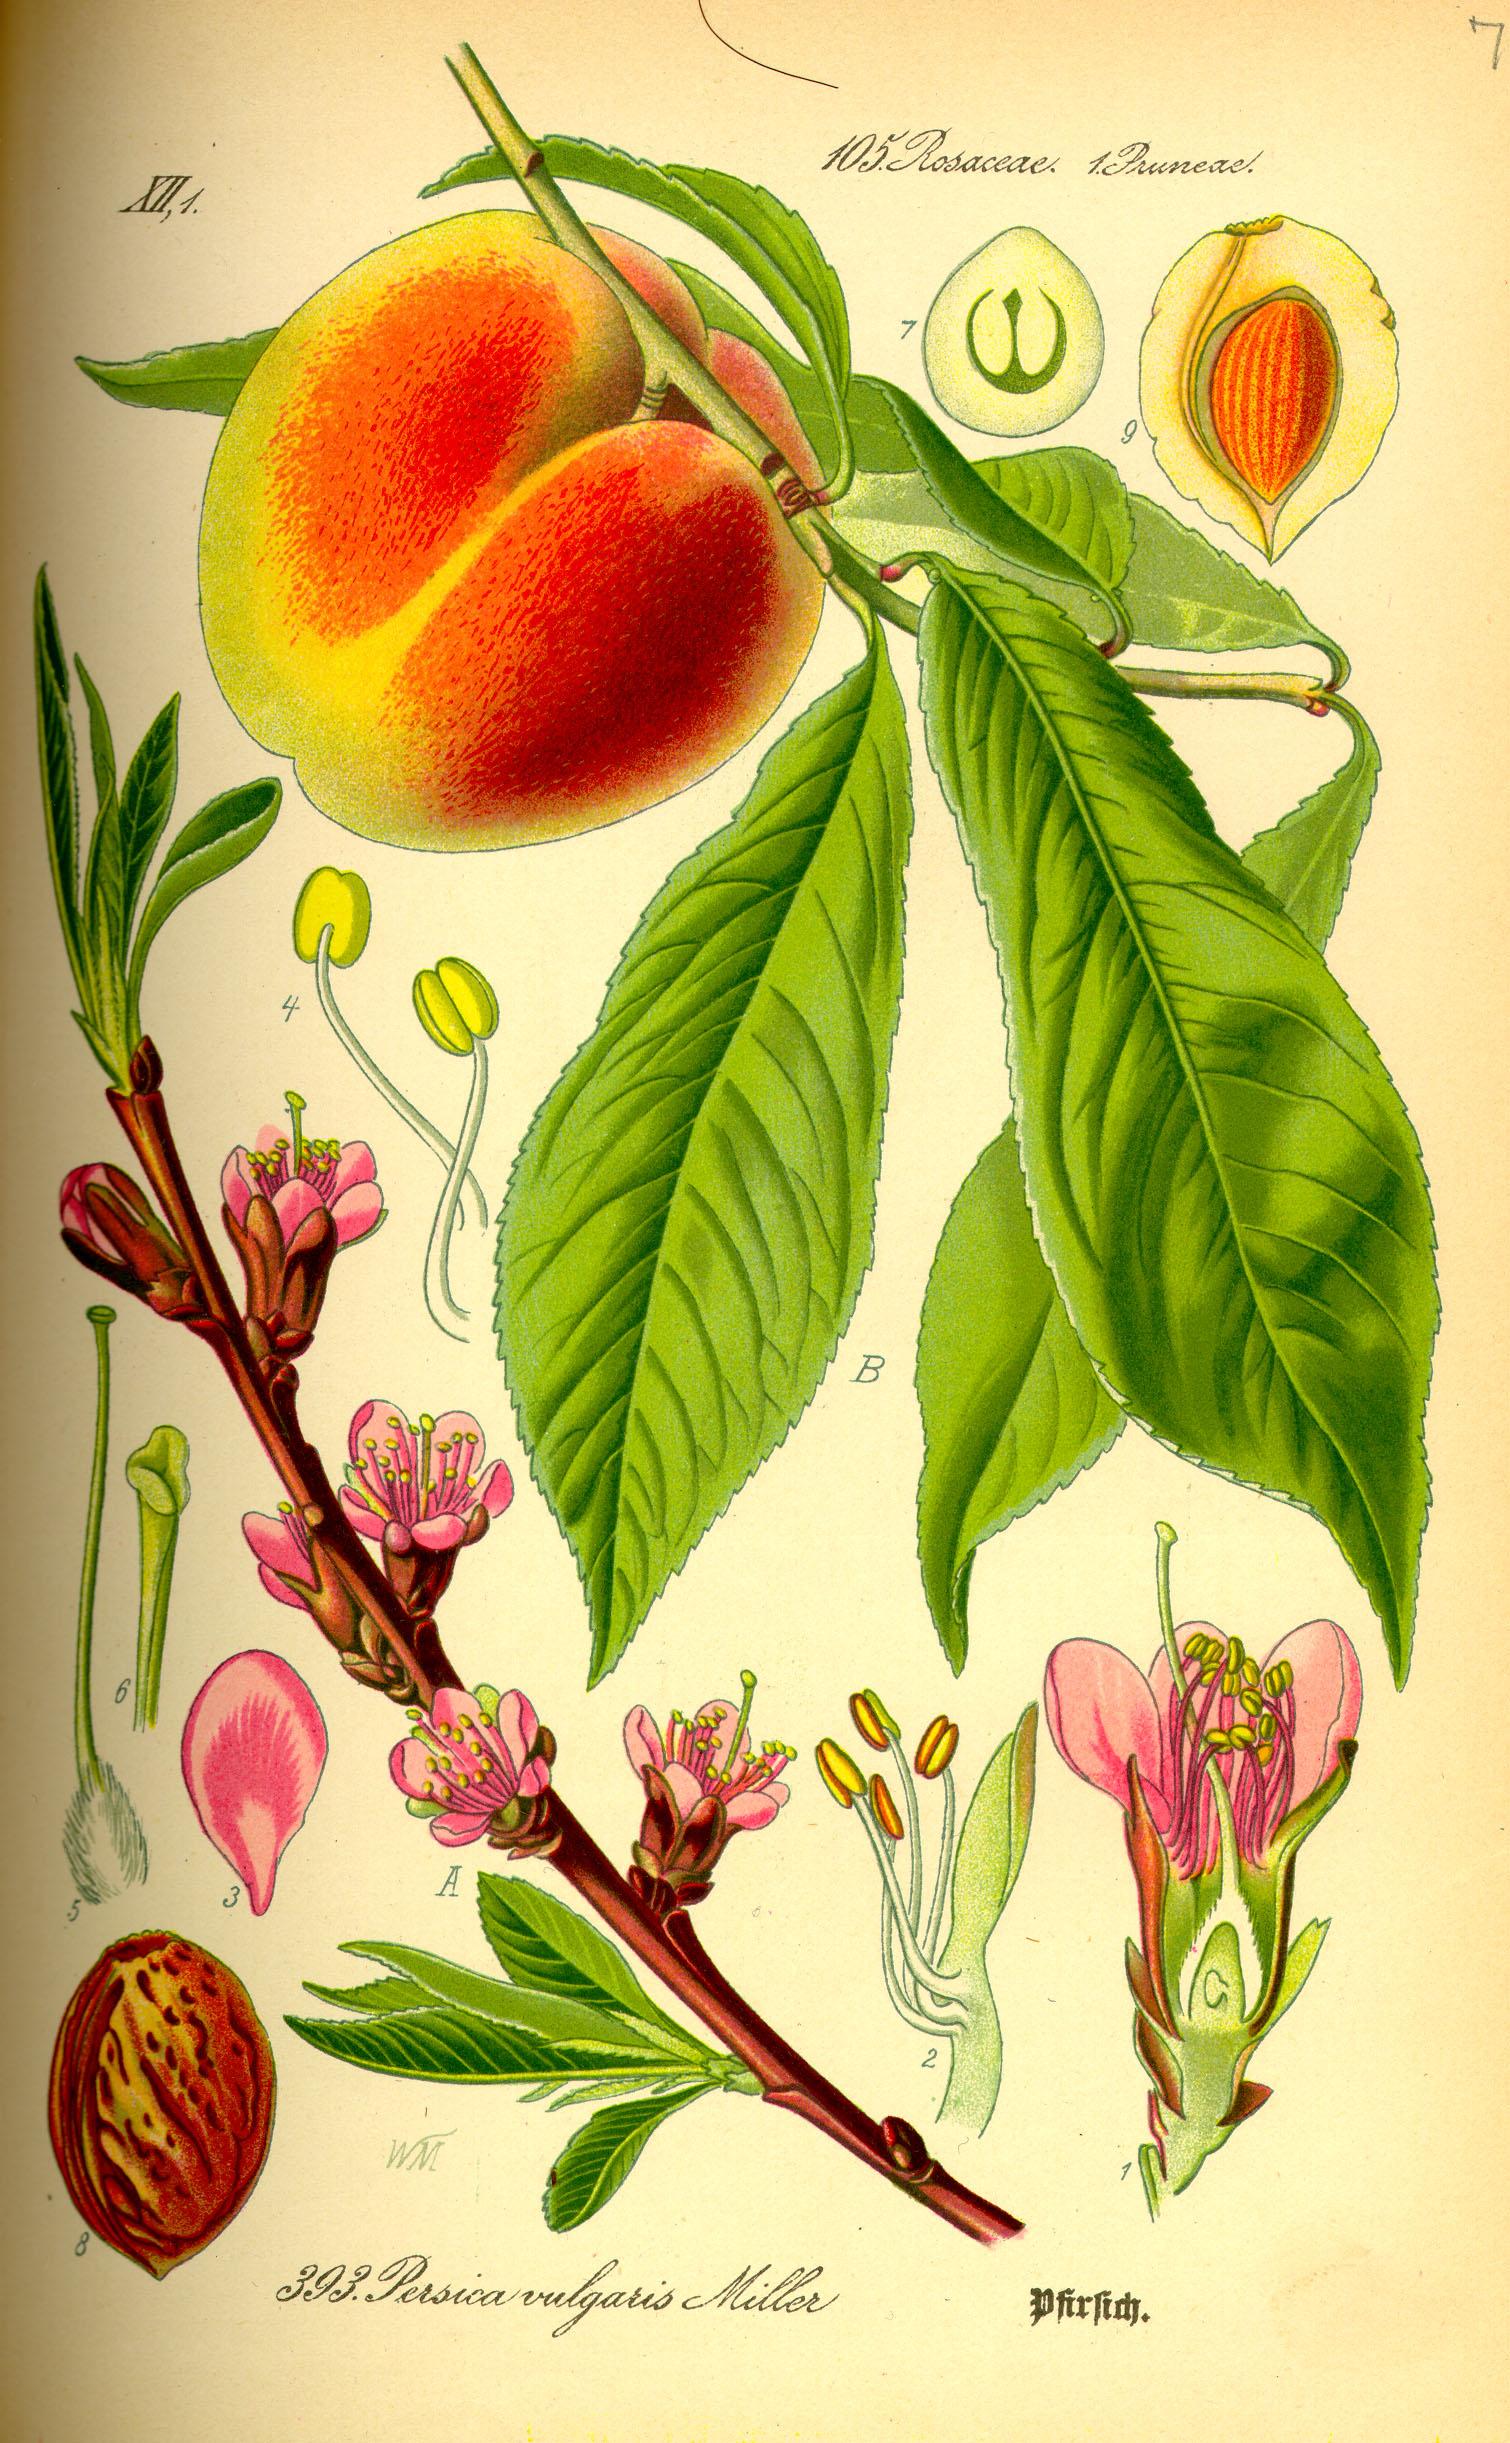 Depiction of Prunus persica